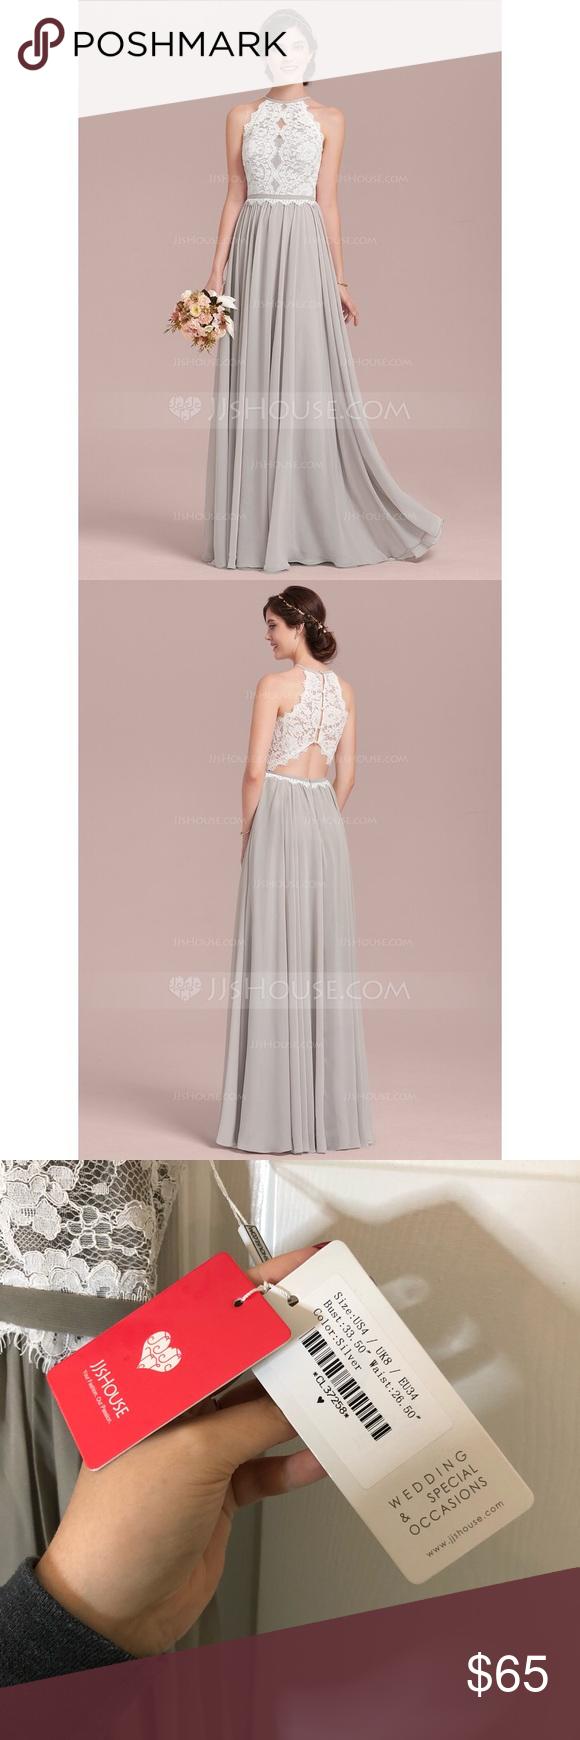 Jjshouse Silver And White Long Formal Dress Winter Wedding Guest Dress Trendy Dresses Formal Formal Dresses Long [ 1740 x 580 Pixel ]